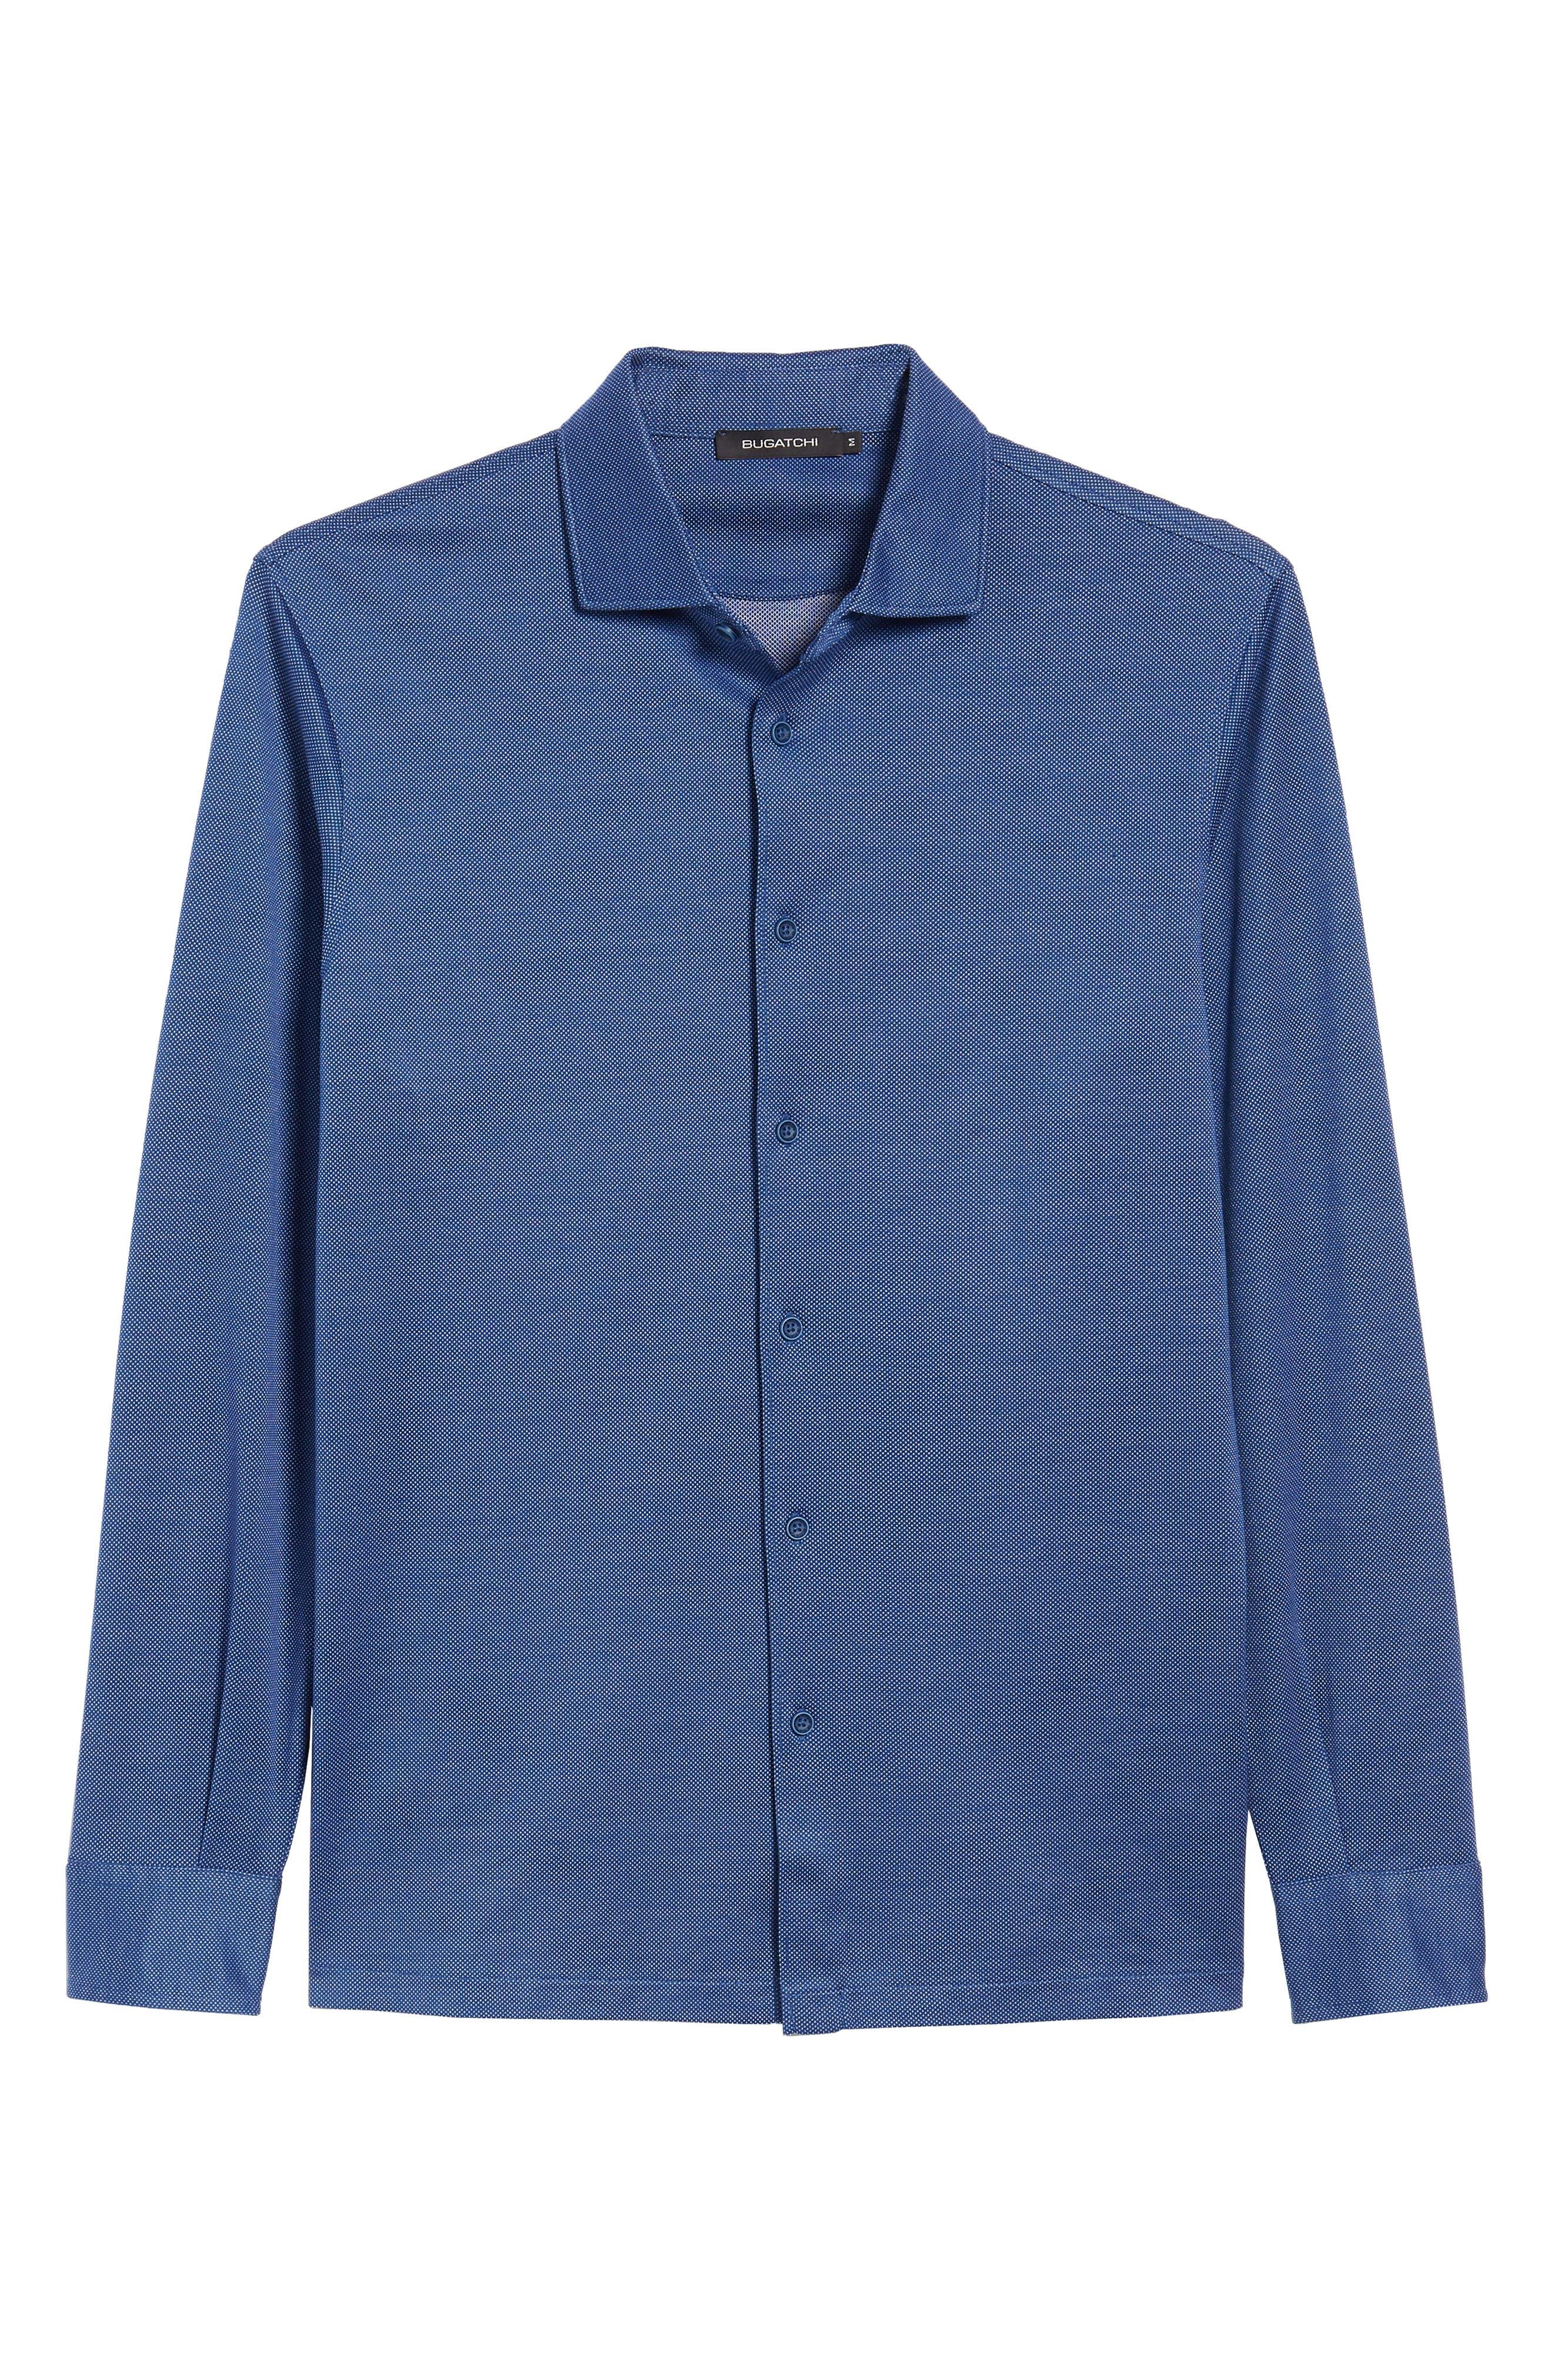 Regular Fit Microdot Print Knit Sport Shirt,                             Alternate thumbnail 6, color,                             411